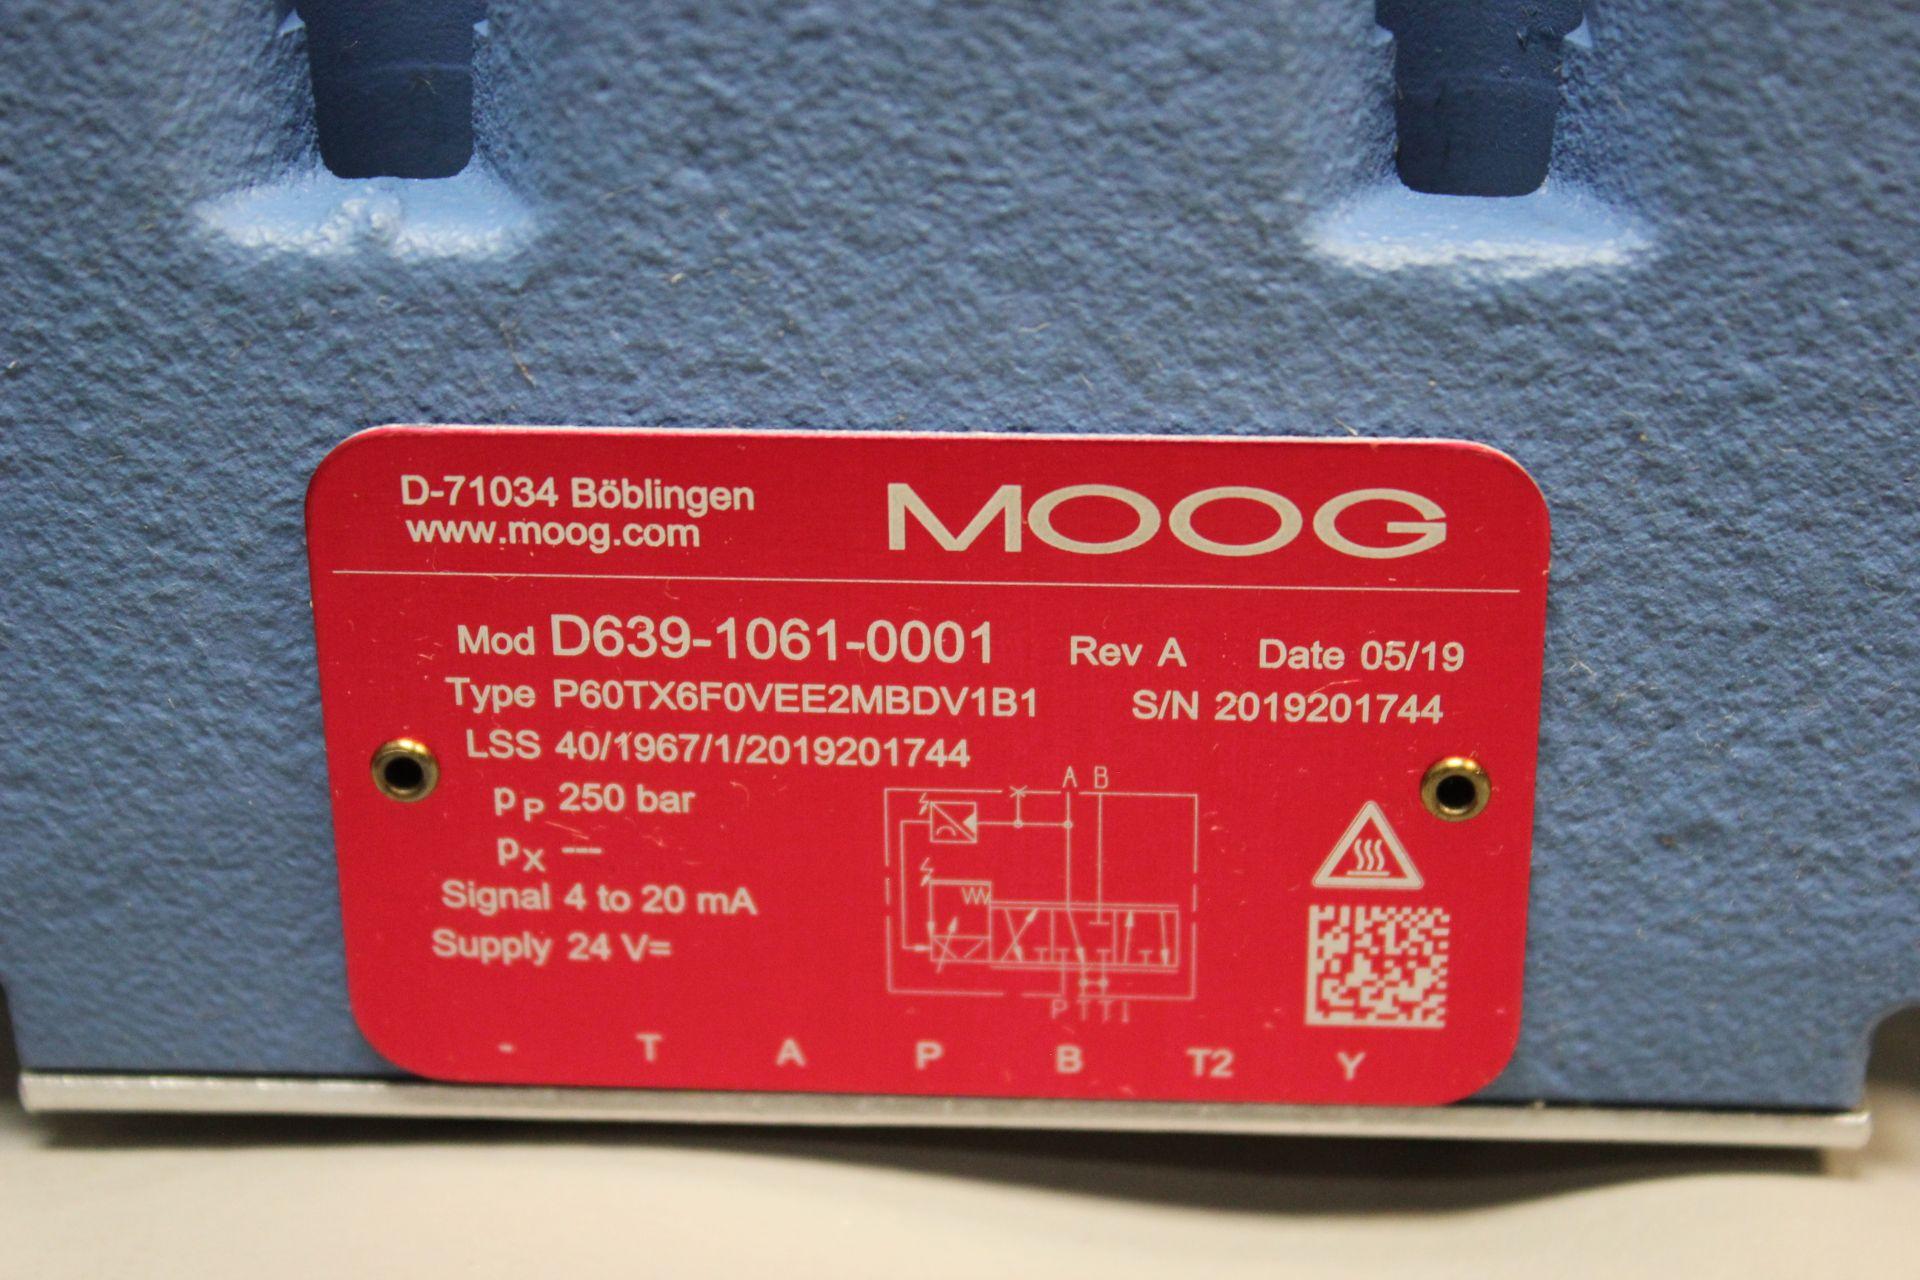 NEW MOOG DIRECT DRIVE DIGITAL CONTROL HYDRAULIC SERVO VALVE - Image 5 of 15